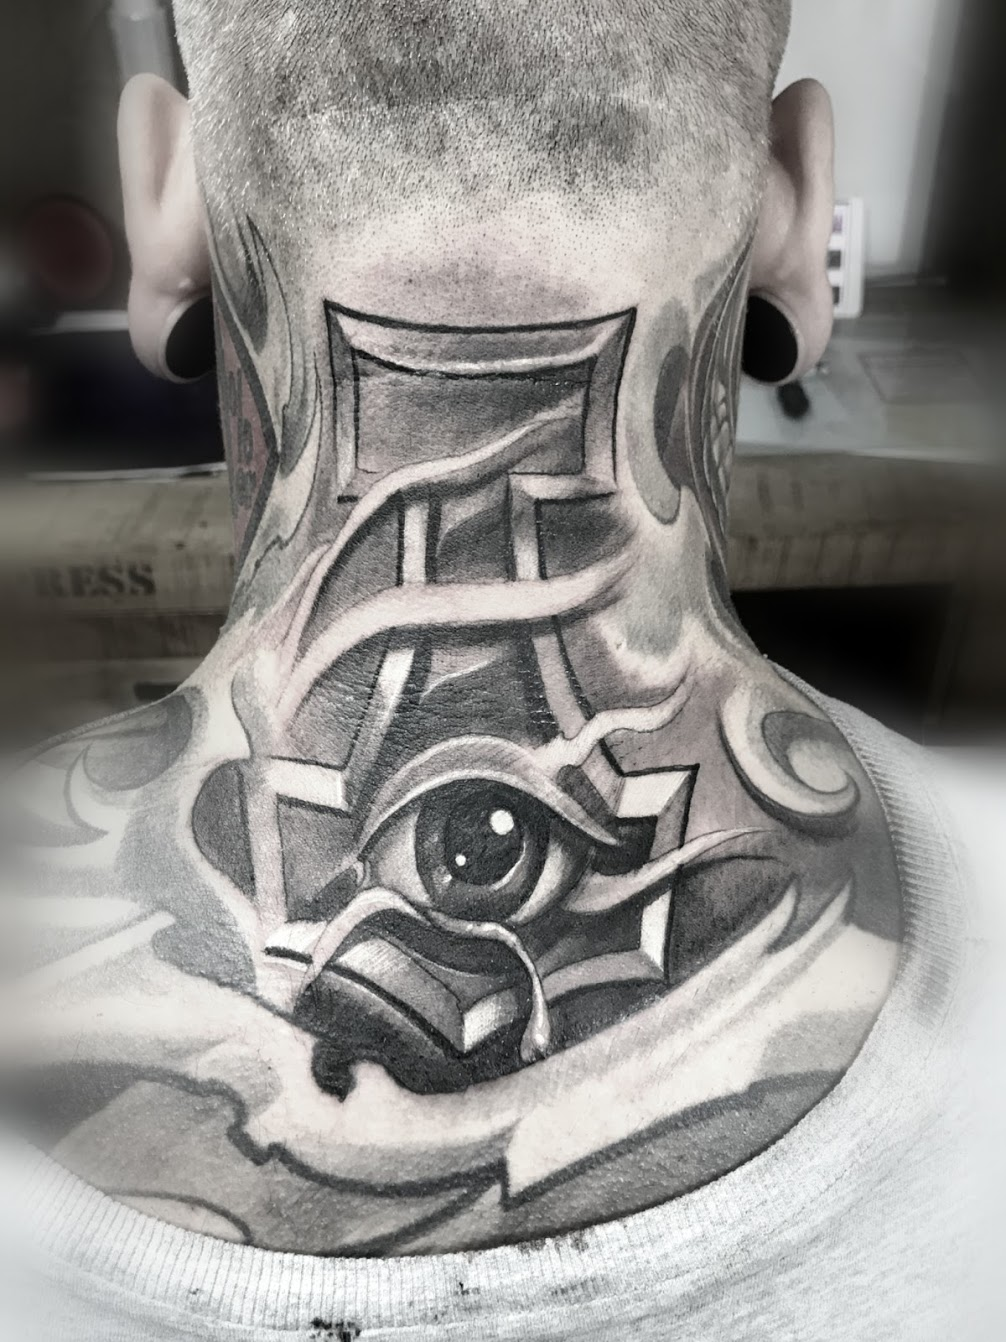 Tattoo-Nacken